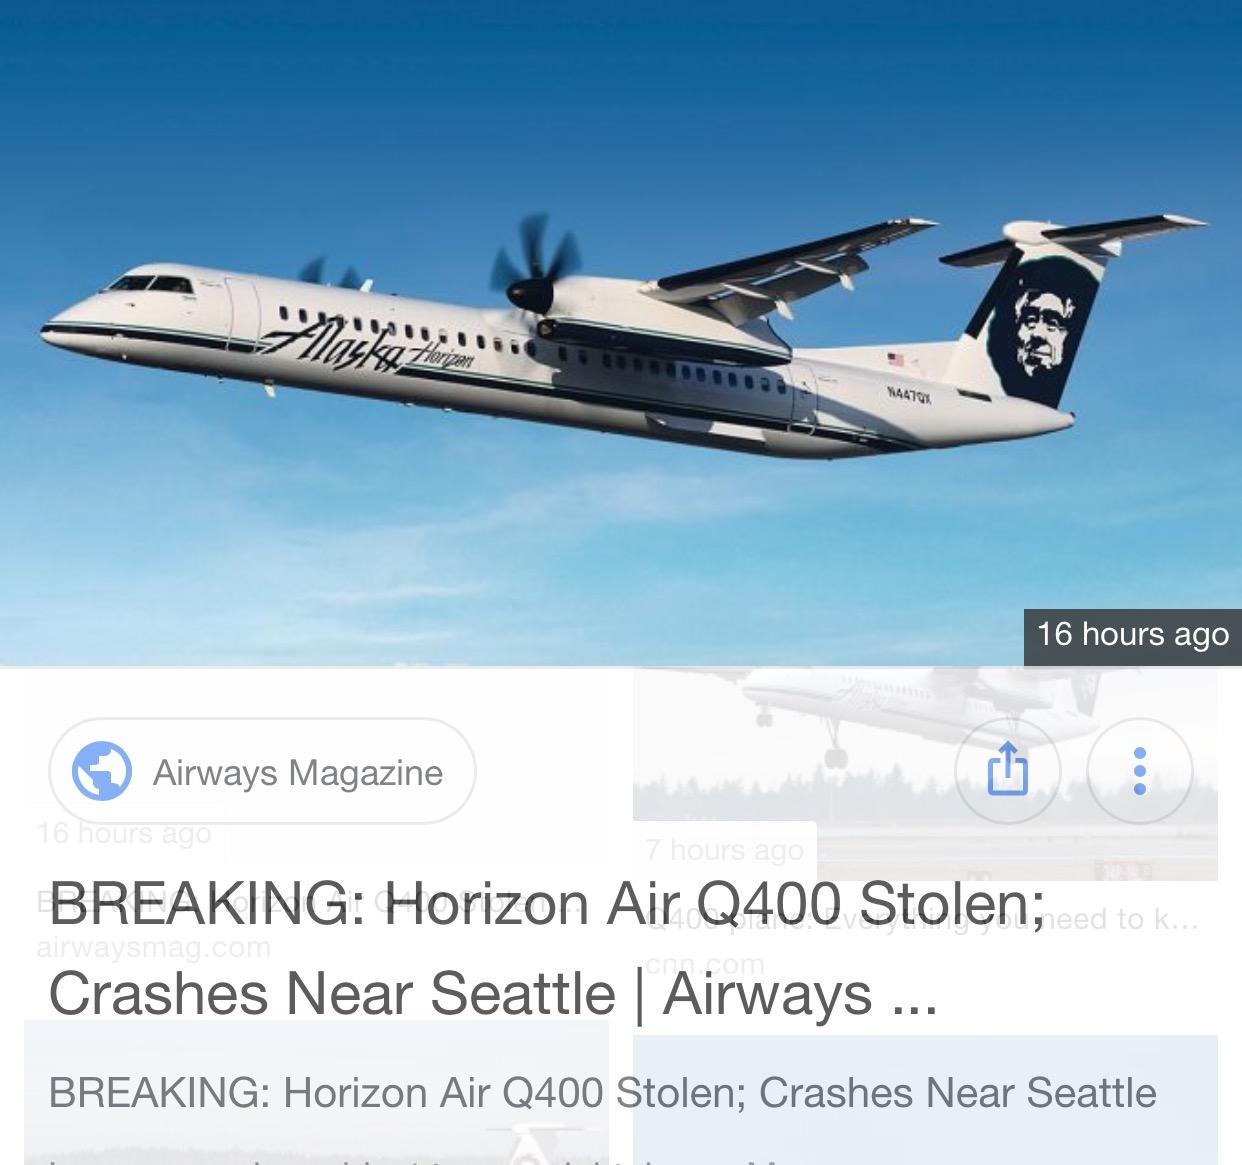 Stolen Regional Airline Aircraft, but how?